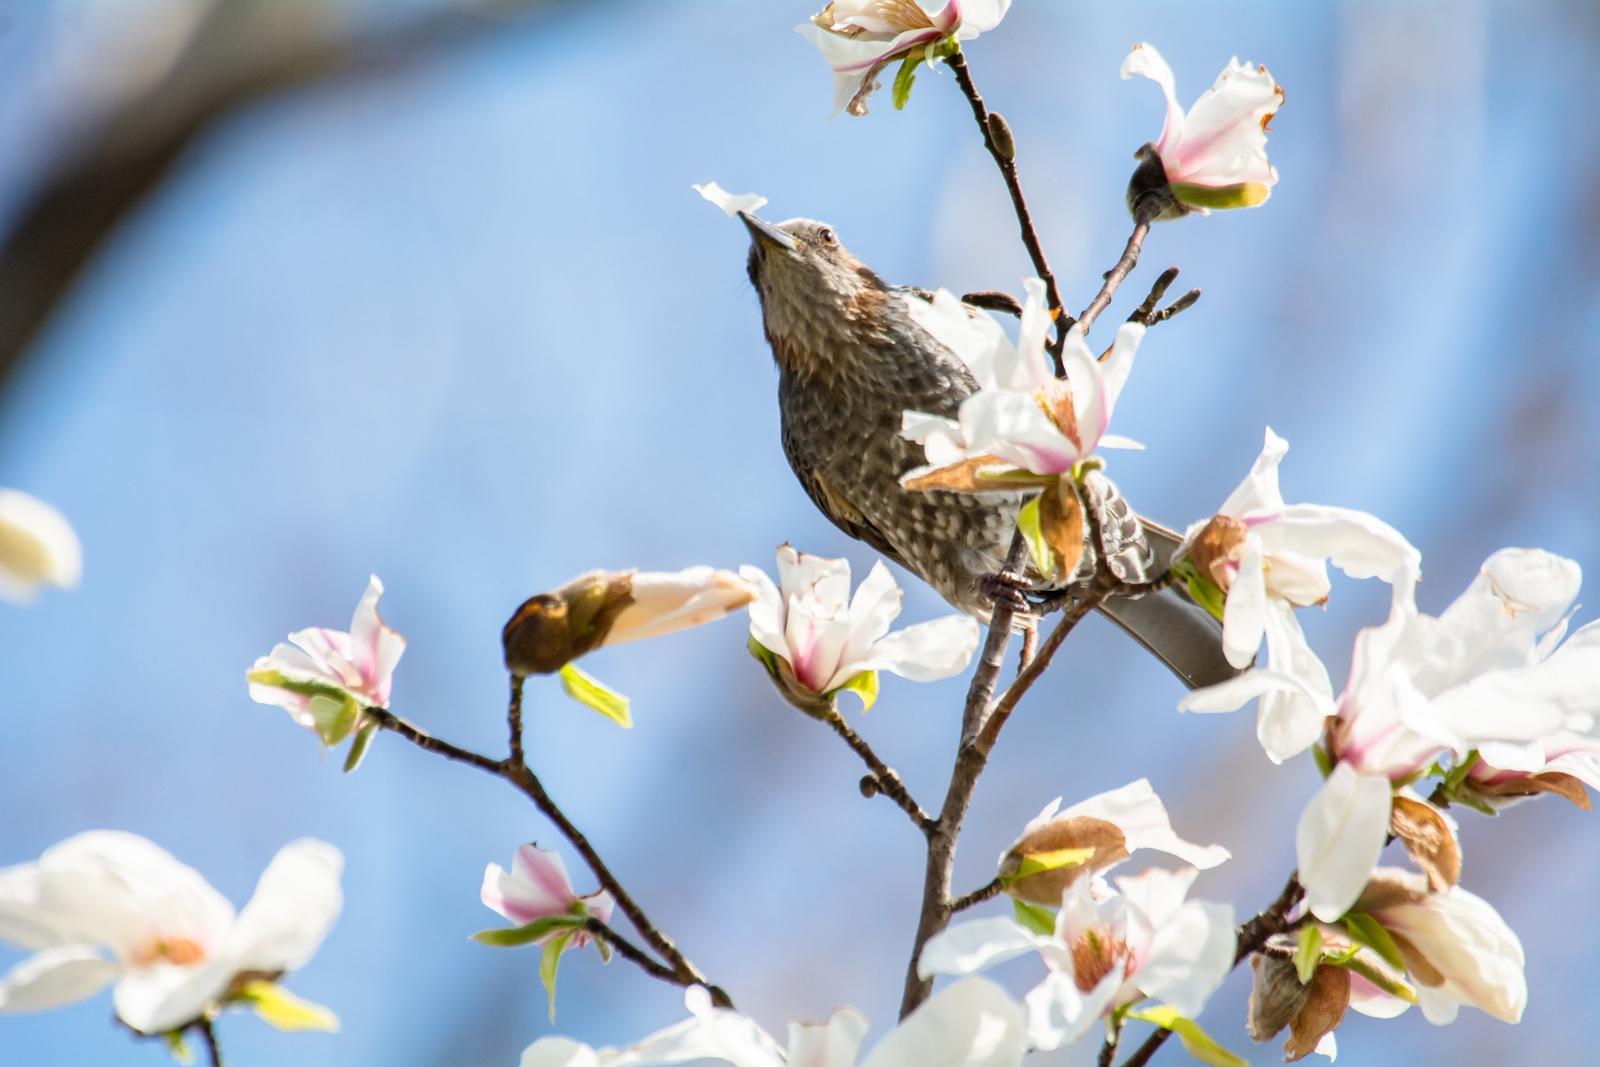 Photo: 花の楽しみ Delicious flowers.  春の花 彩り豊かに季節を染める そして食いしん坊達の 食欲までも満たしてくれる  Kobushi magnolia and Brown-eared Bulbul. (水元公園のコブシとヒヨドリ)  #IslandGallery_BrightLights +Takahiro Yamamoto +Island Gallery  #365cooljapanmay #cooljapan  #birdphotography #birds  #kawaii #sigma #nikon   Nikon D7100 SIGMA APO 50-500mm F5-6.3 DG OS HSM [ Day333, April 10th ] (2枚追加:Added 2 photo)  小鳥の詩朗読 https://youtu.be/MWAJNHUqazE?list=PL2YtHGm0-R3qVsaqvQe9OYdJFCkI98wzF